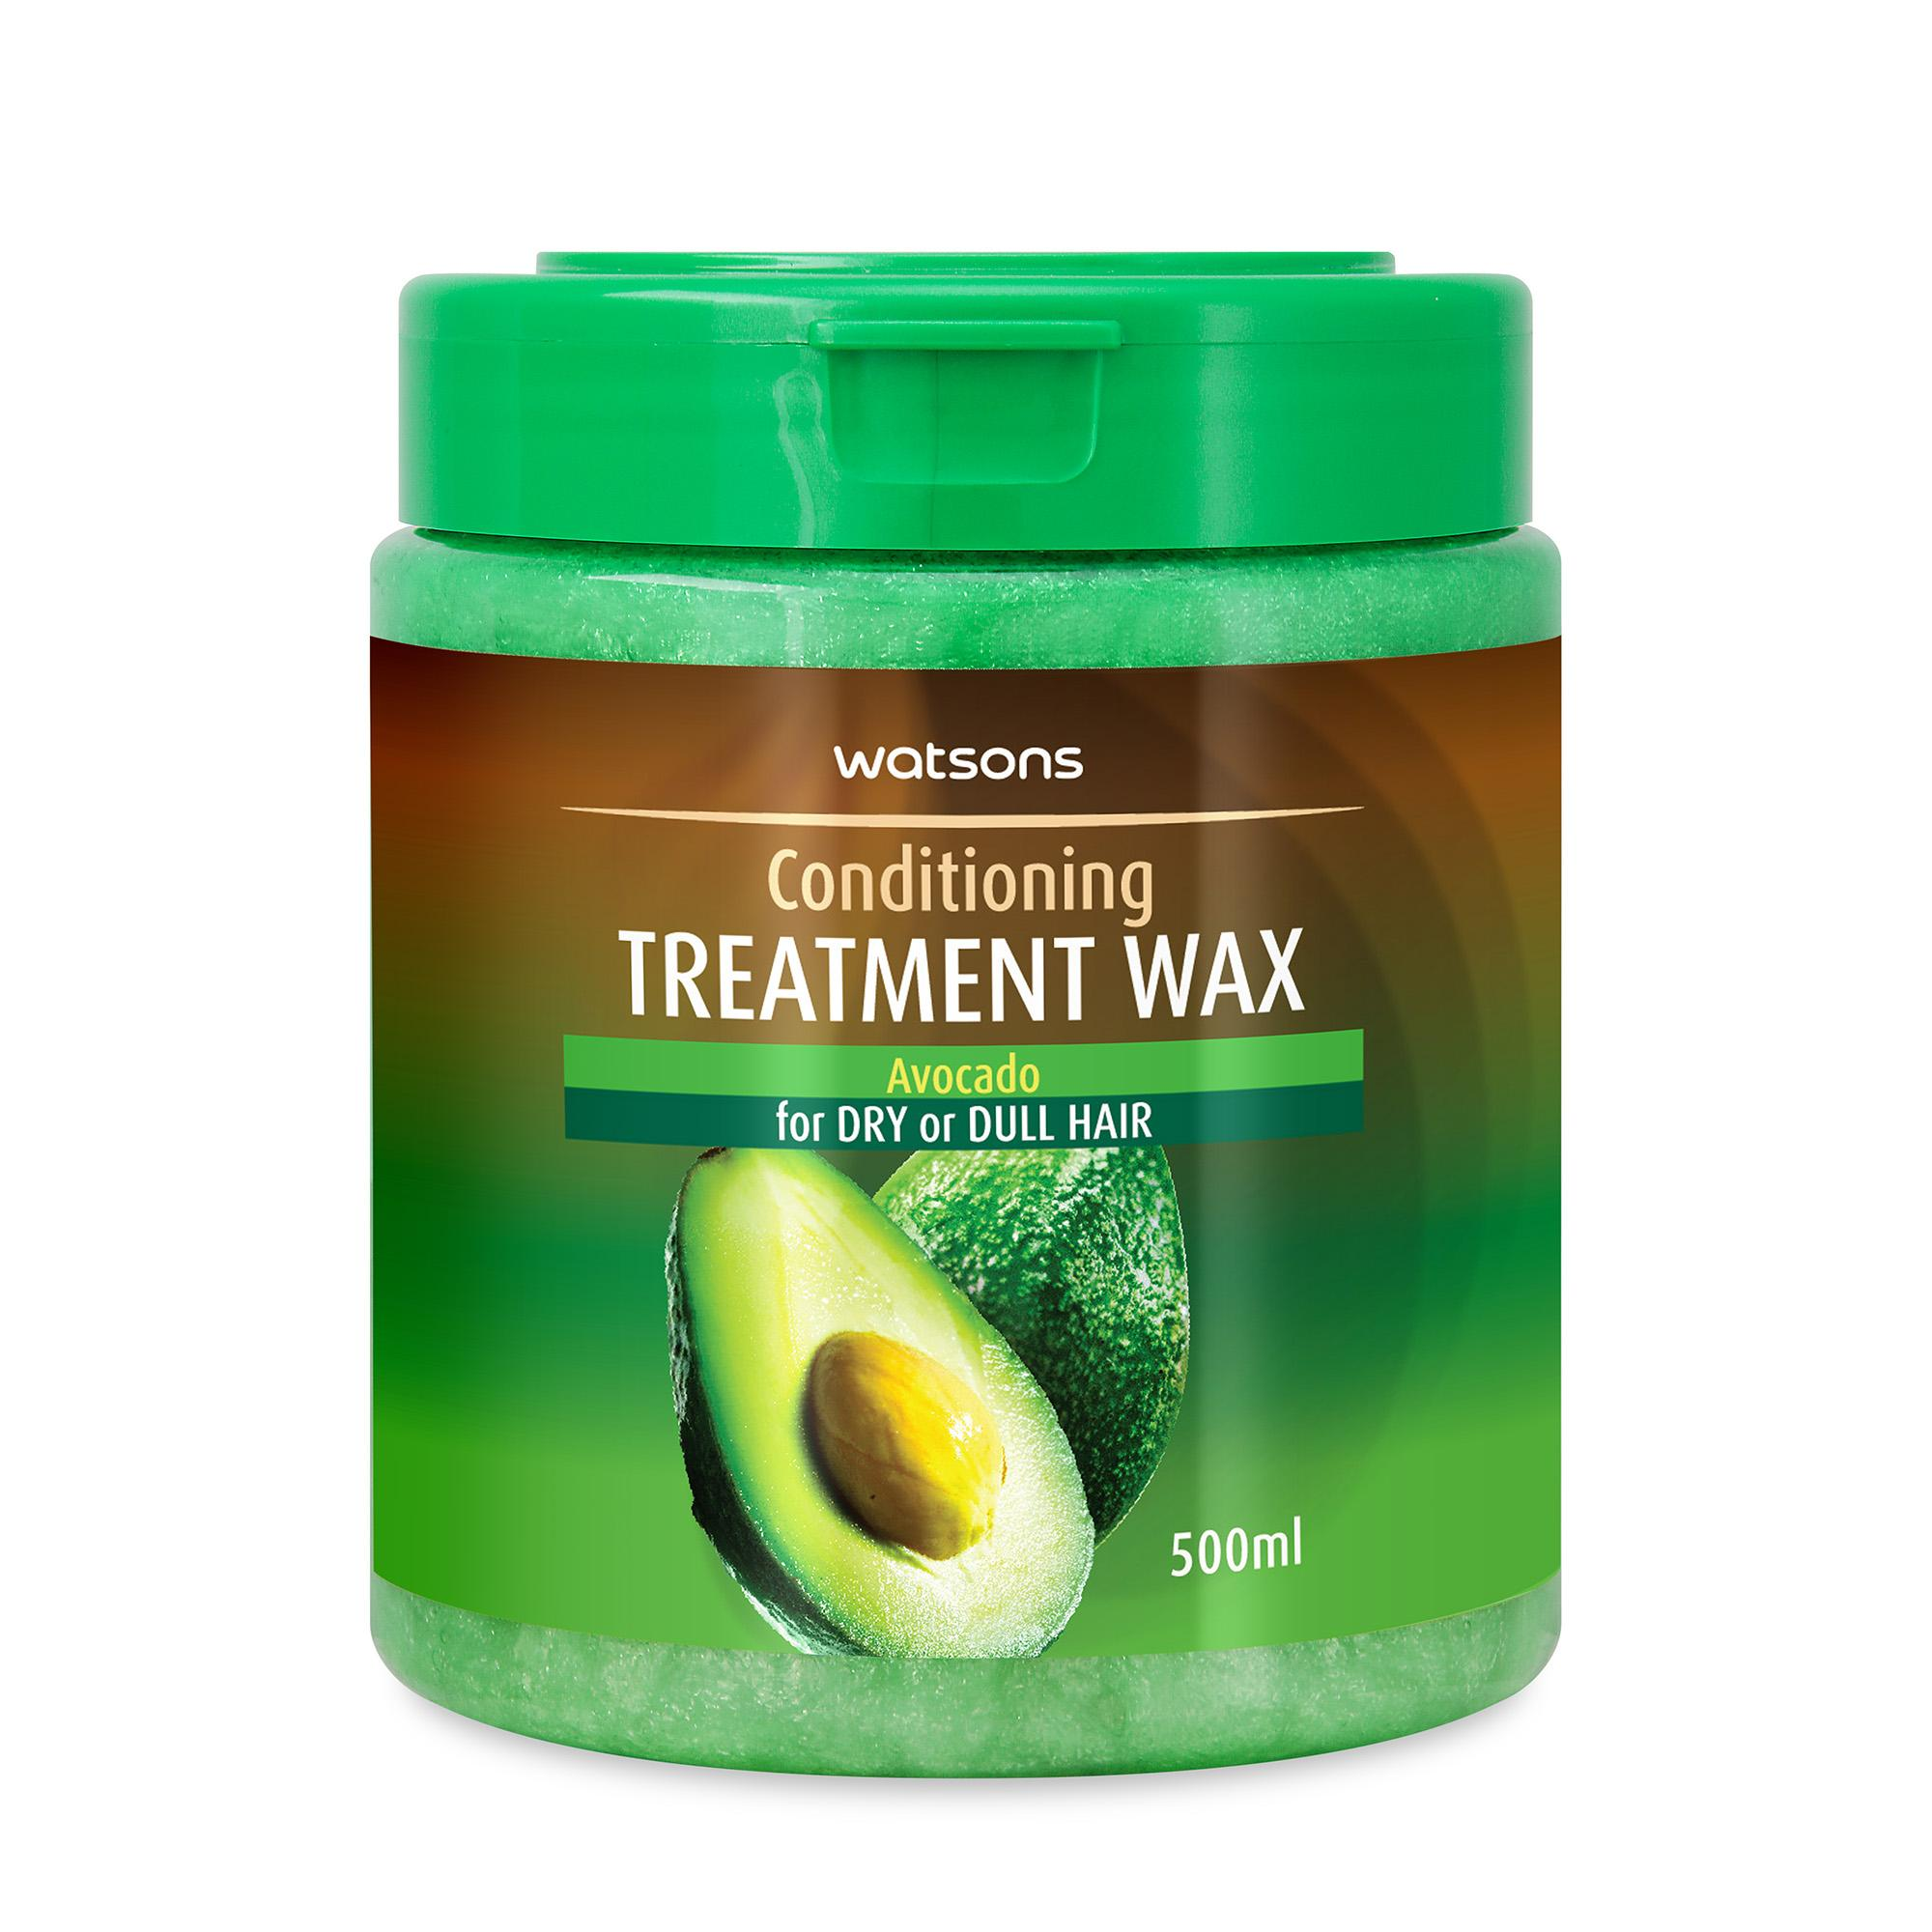 Kelebihan C One Pet Care Conditioning Shampoo Concentrate 500ml Makarizo Hair Energy Olive Extract 170 Ml Watsons Avocado Treatment Wax